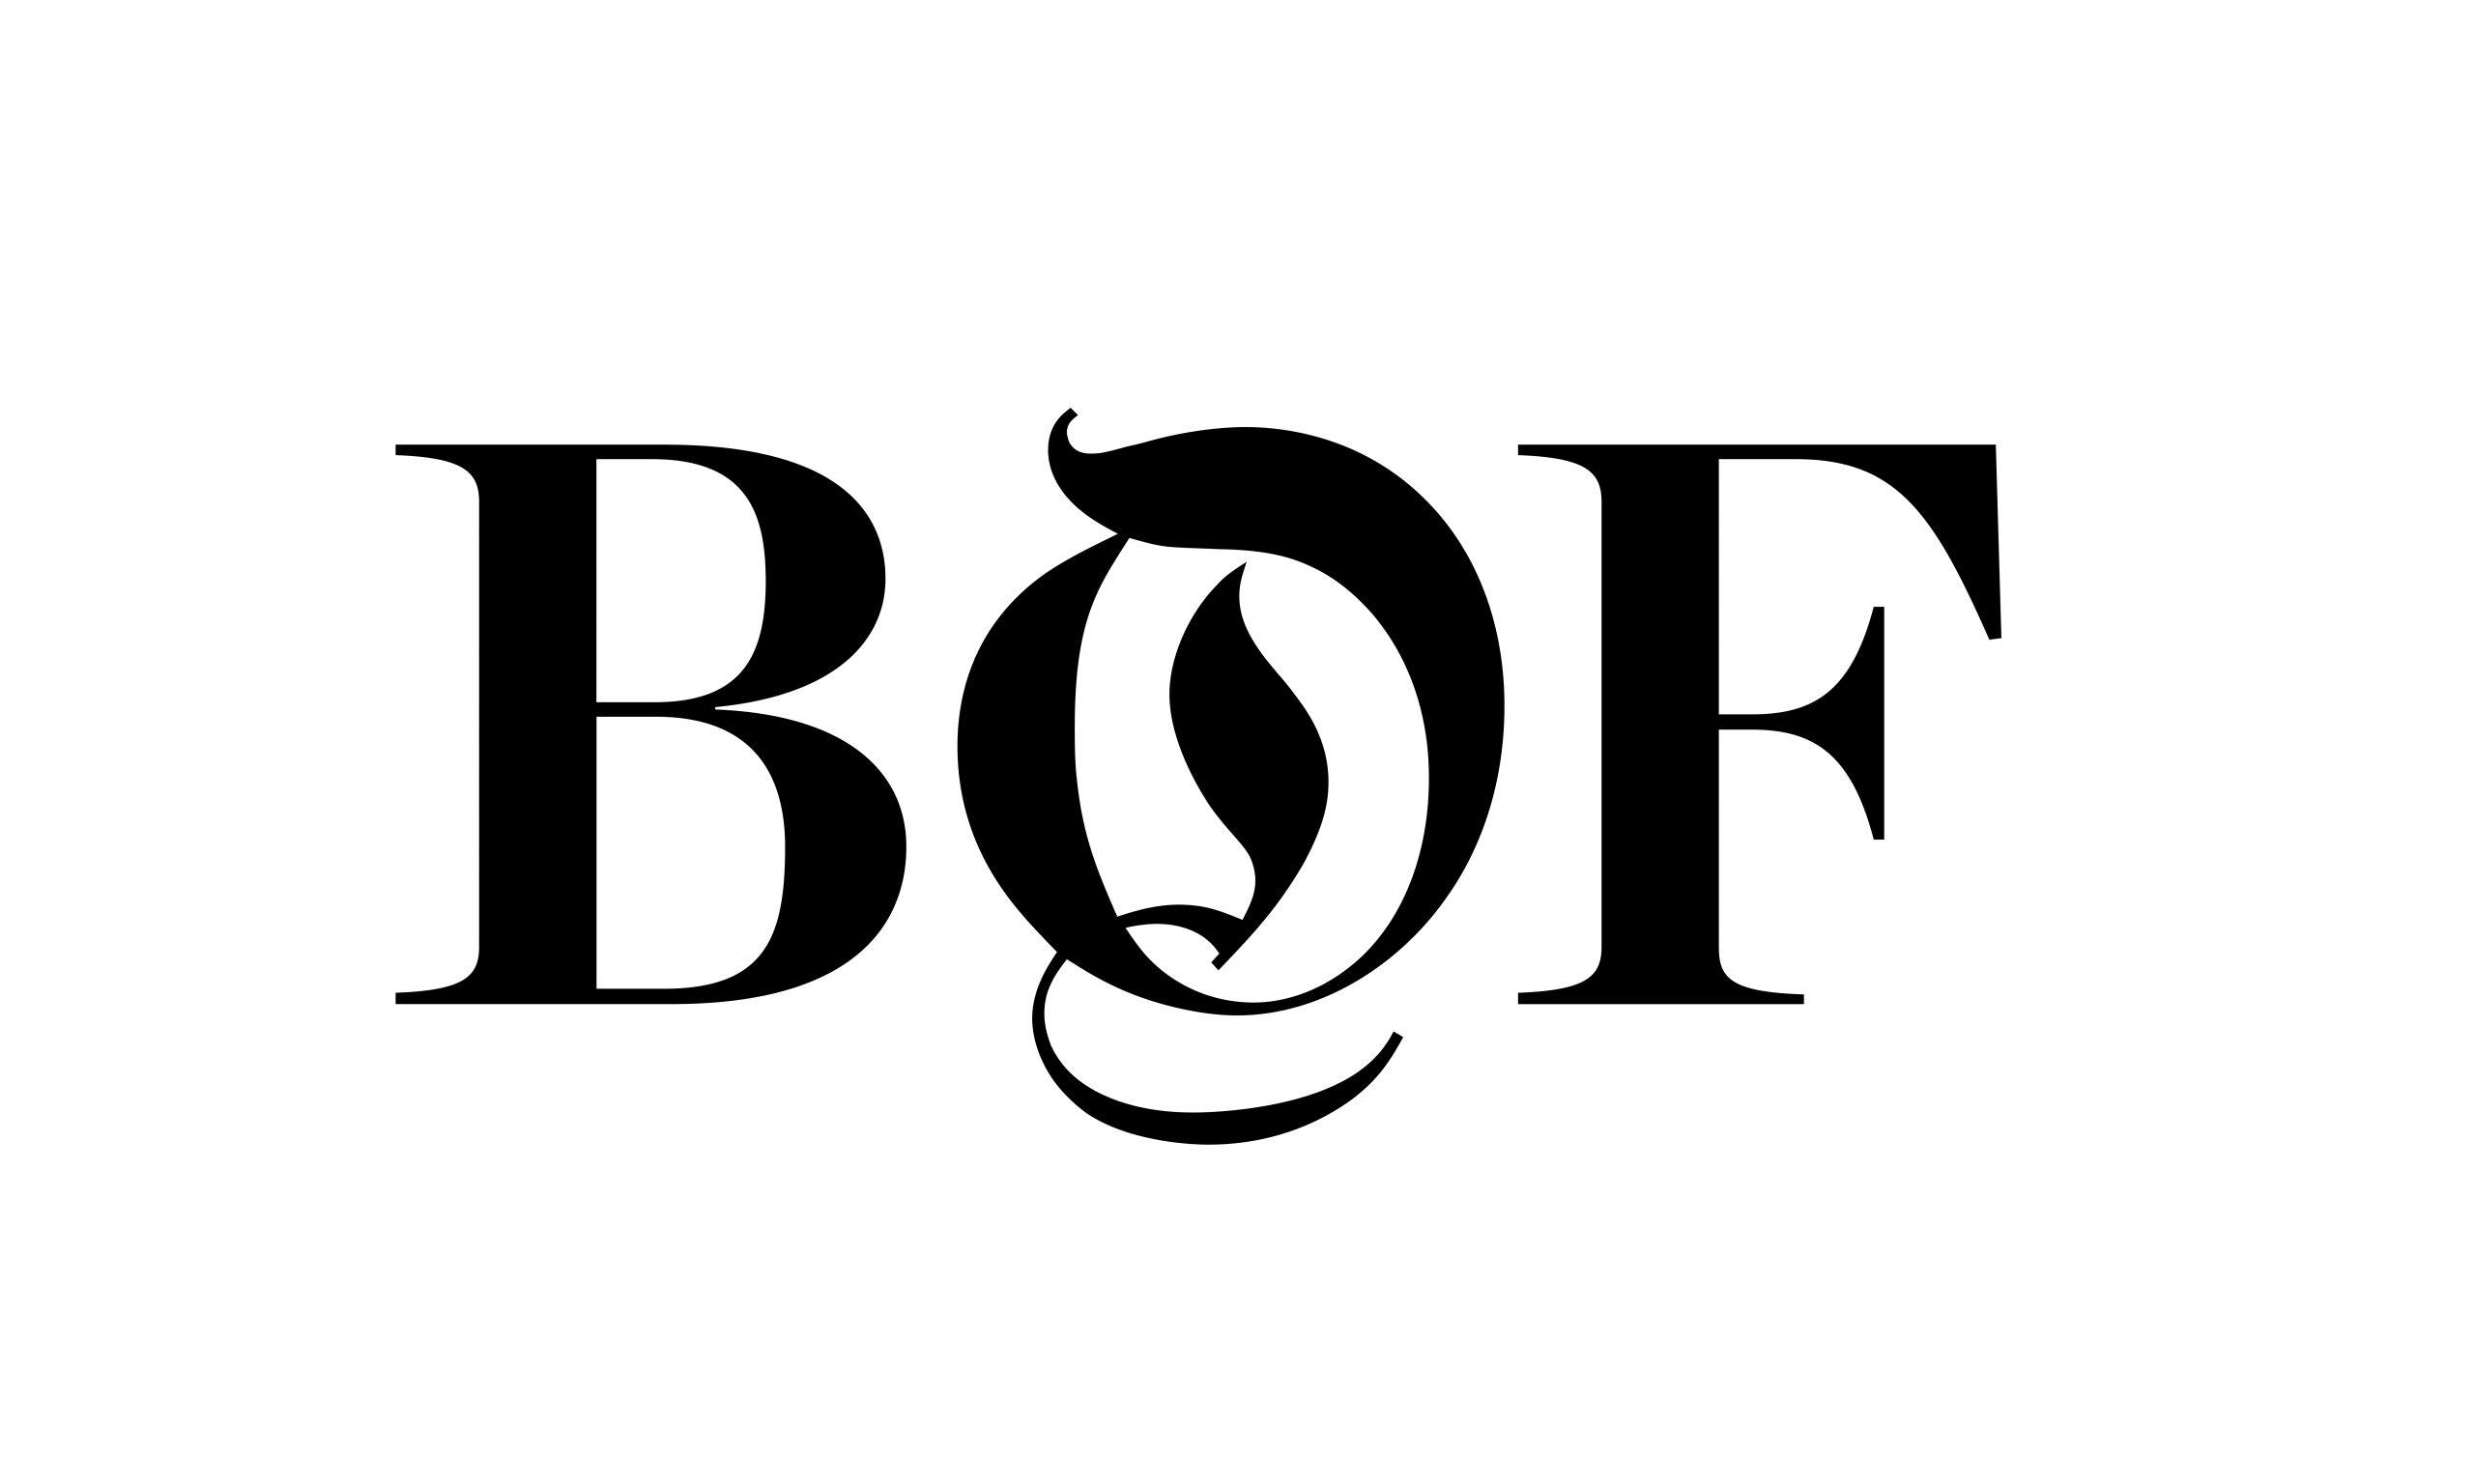 BoF 时装商业评论中国区被全员裁撤